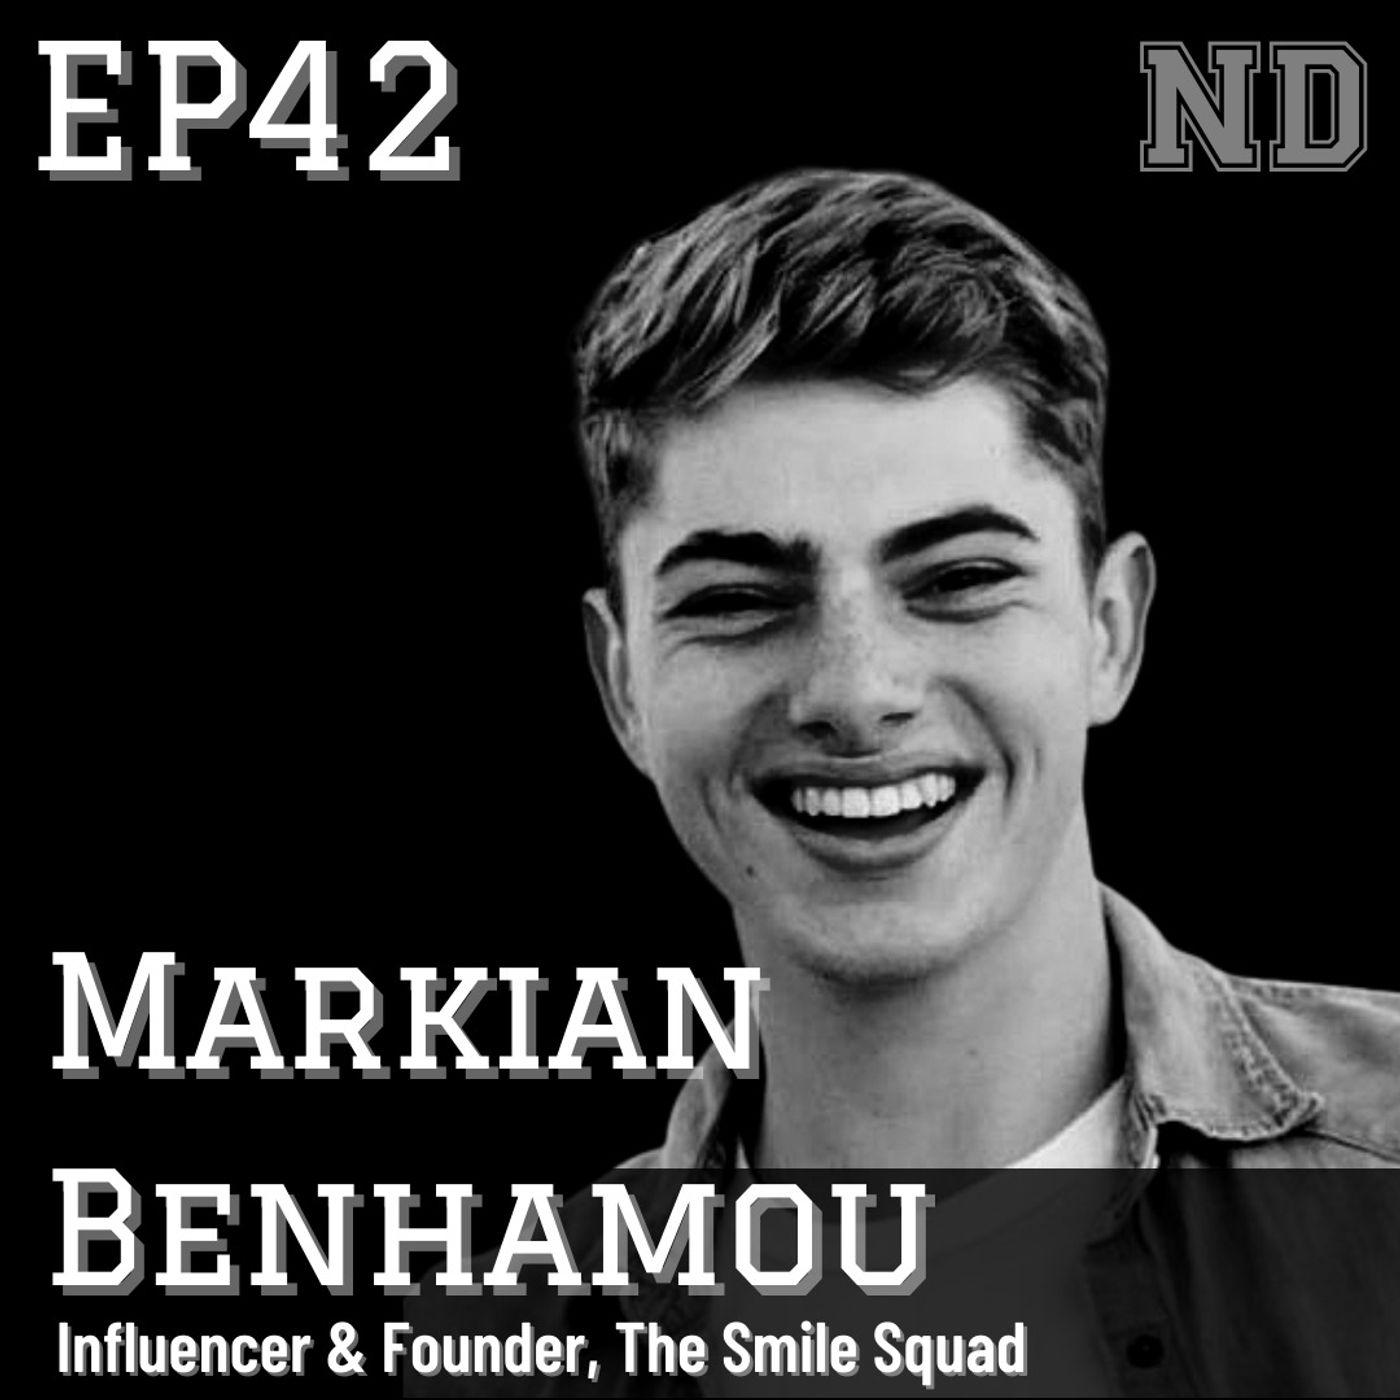 Markian Benhamou Shy Kid to Social Media Influencer Making Happy Videos on the Internet